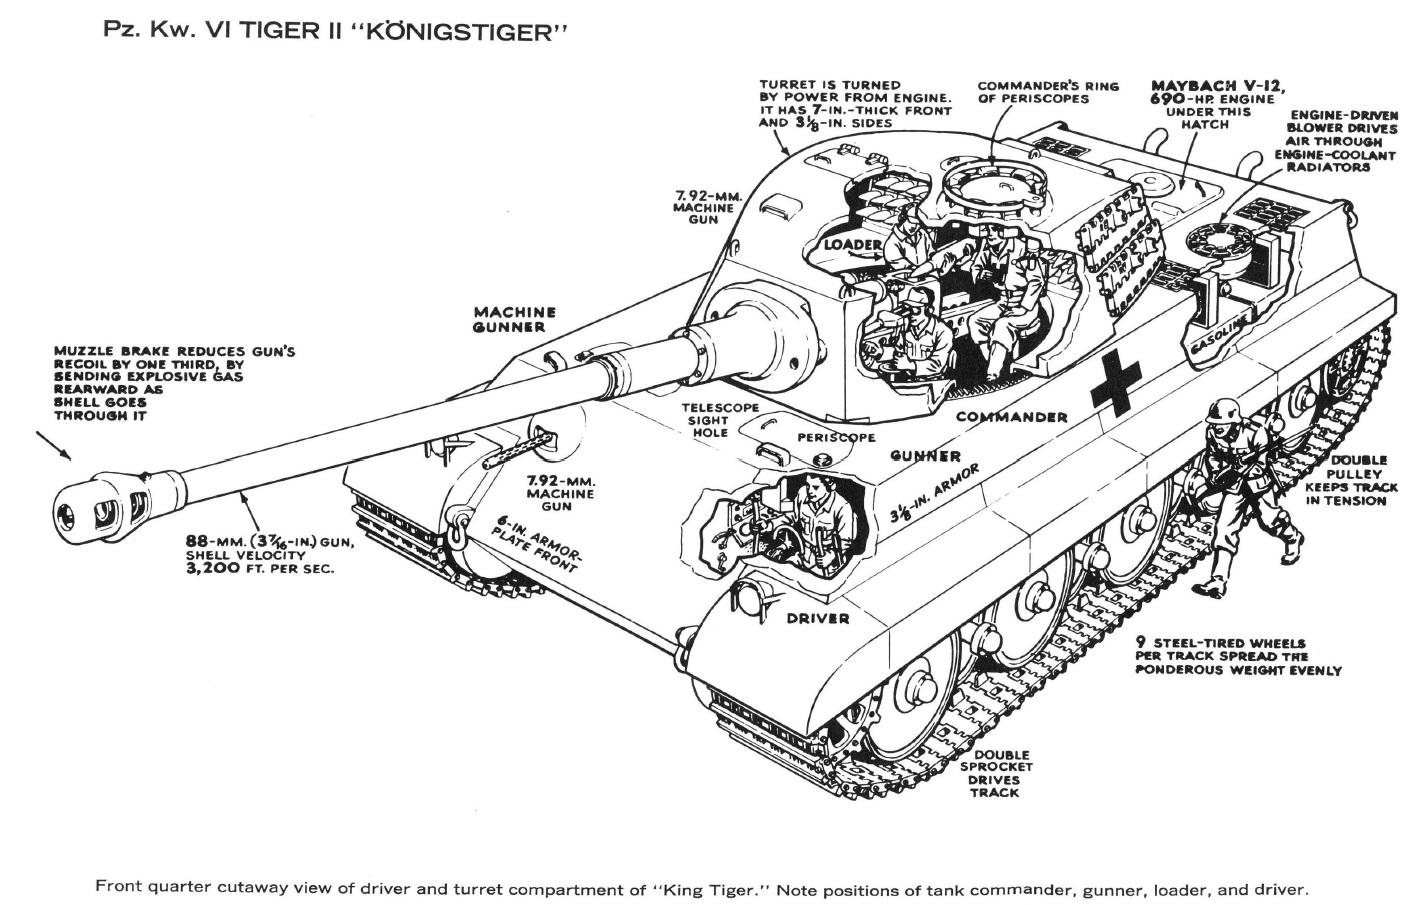 Tmp Stalingrad S New Tiger Ii Set Of Crew Burst Into